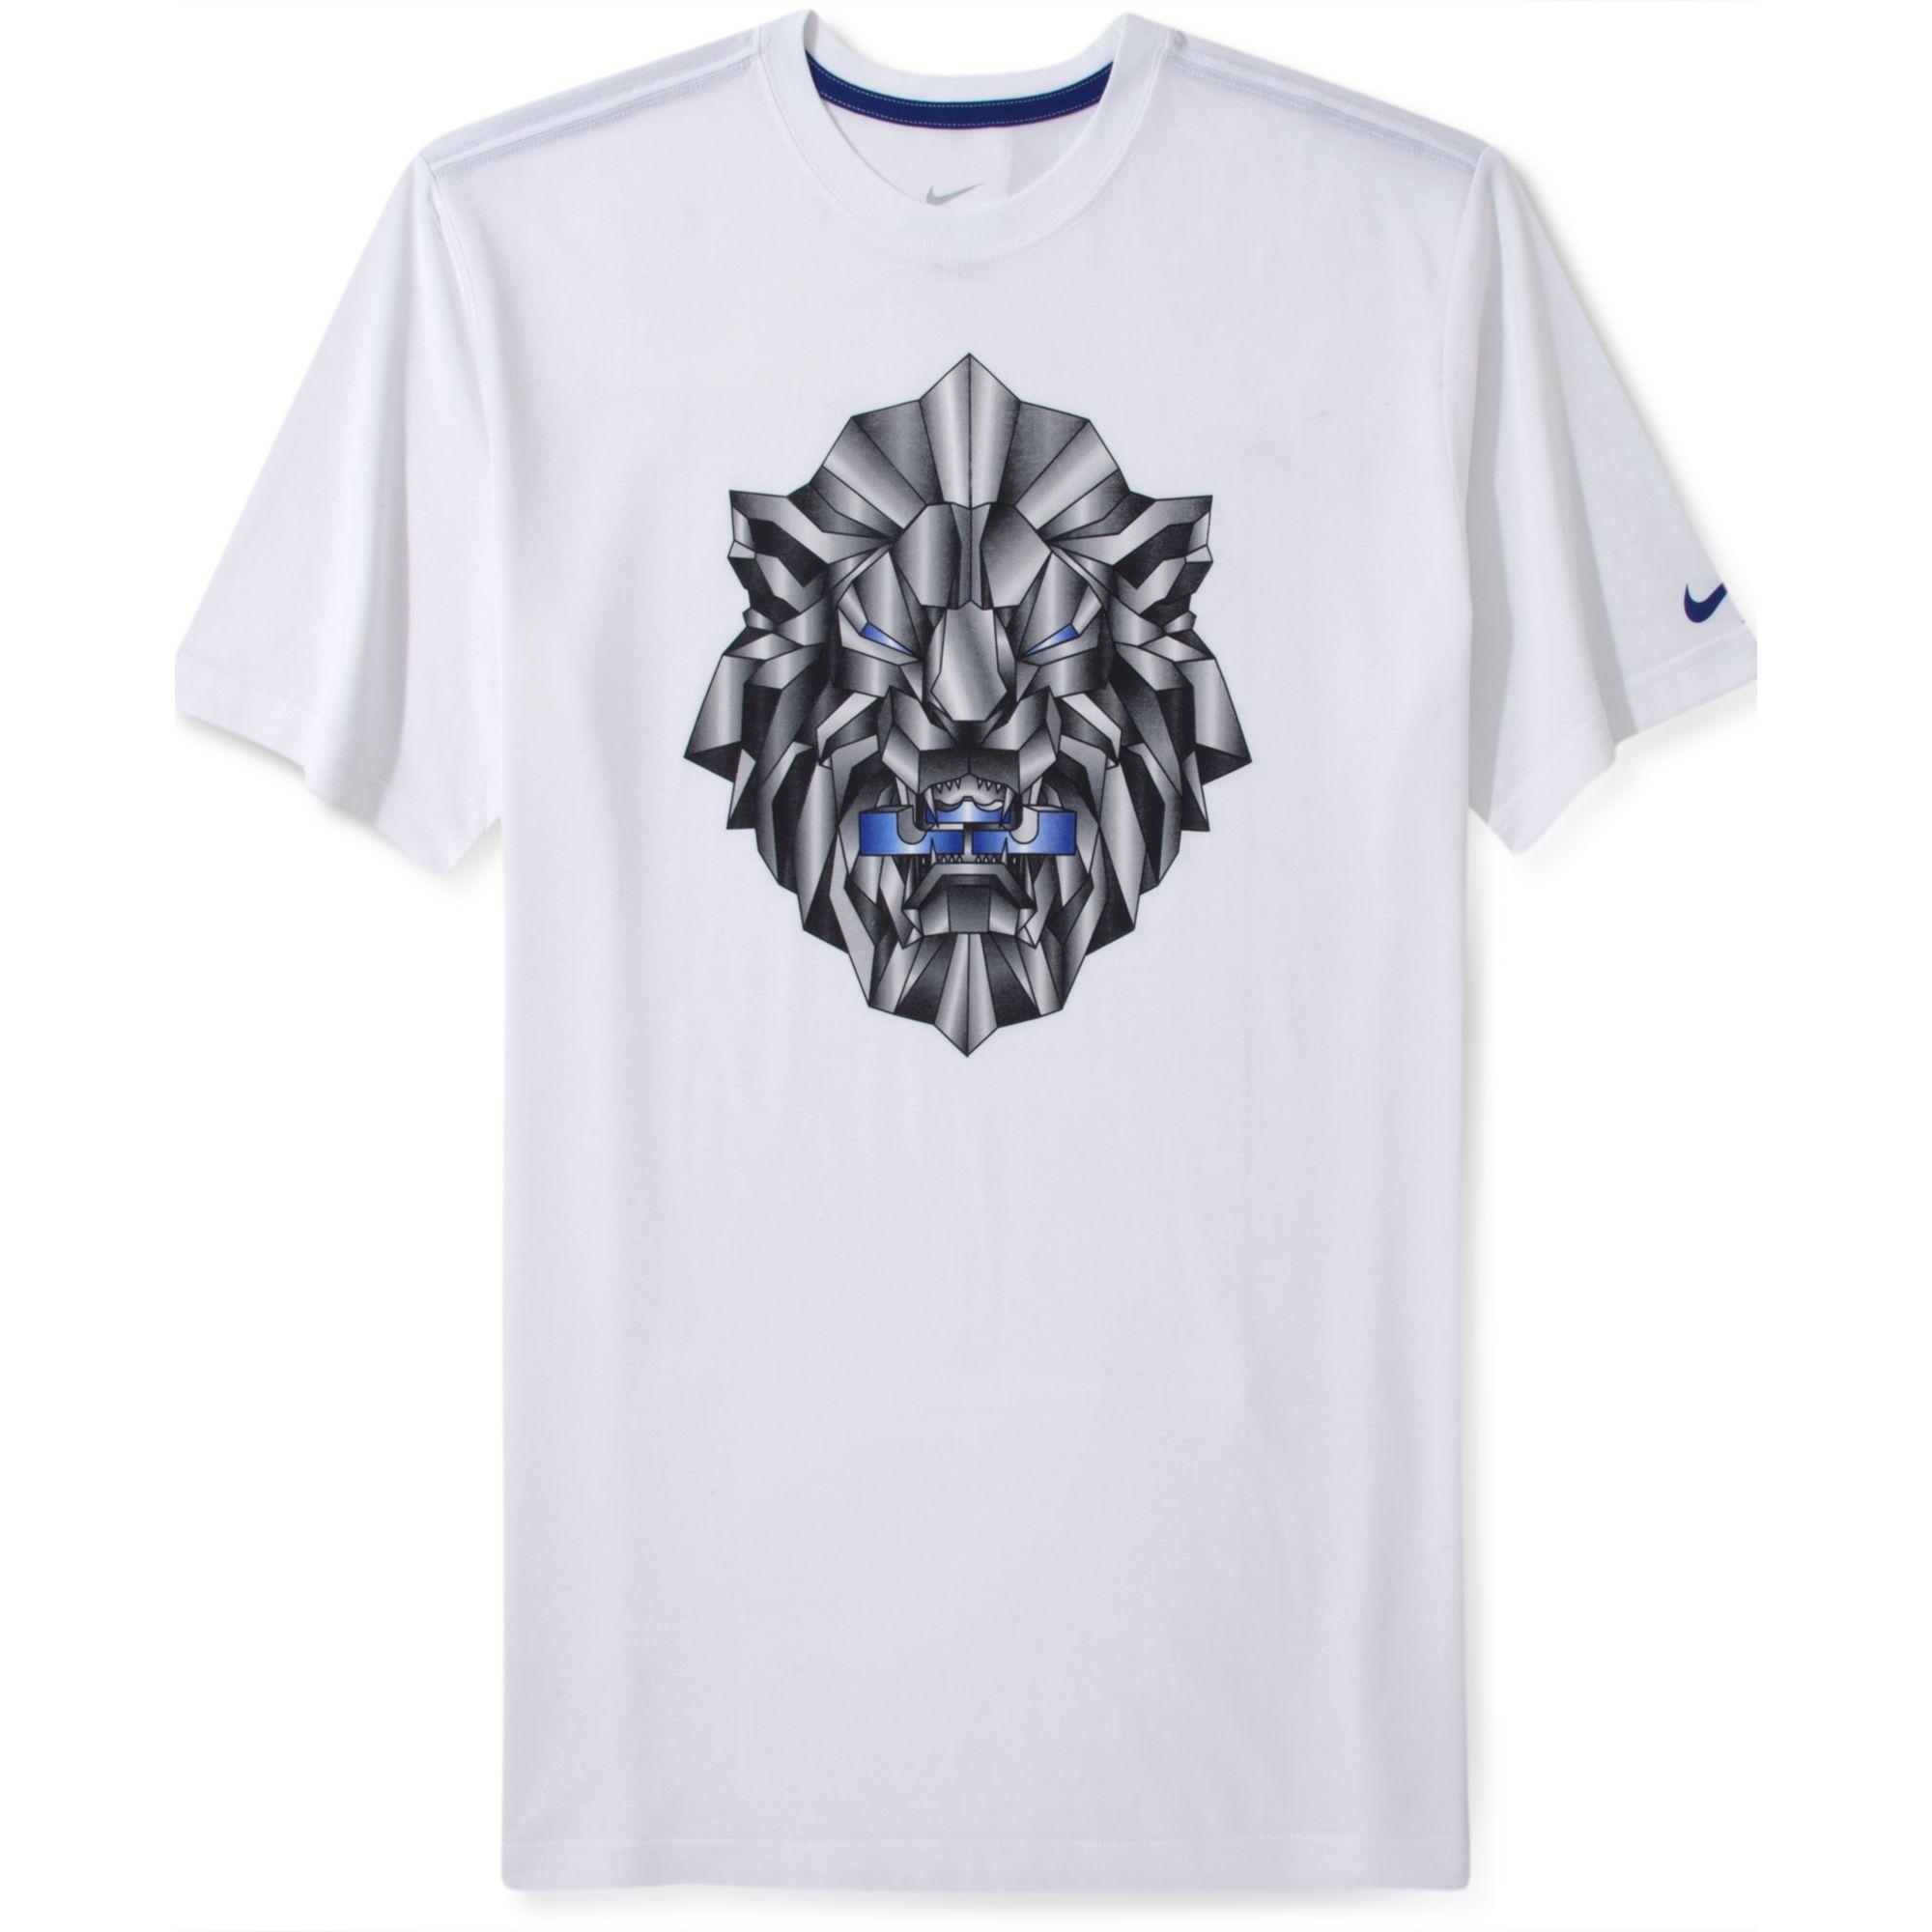 0e4ebb218 Nike Lebron Fan Shortsleeve Drifit Basketball Tshirt in White for ...